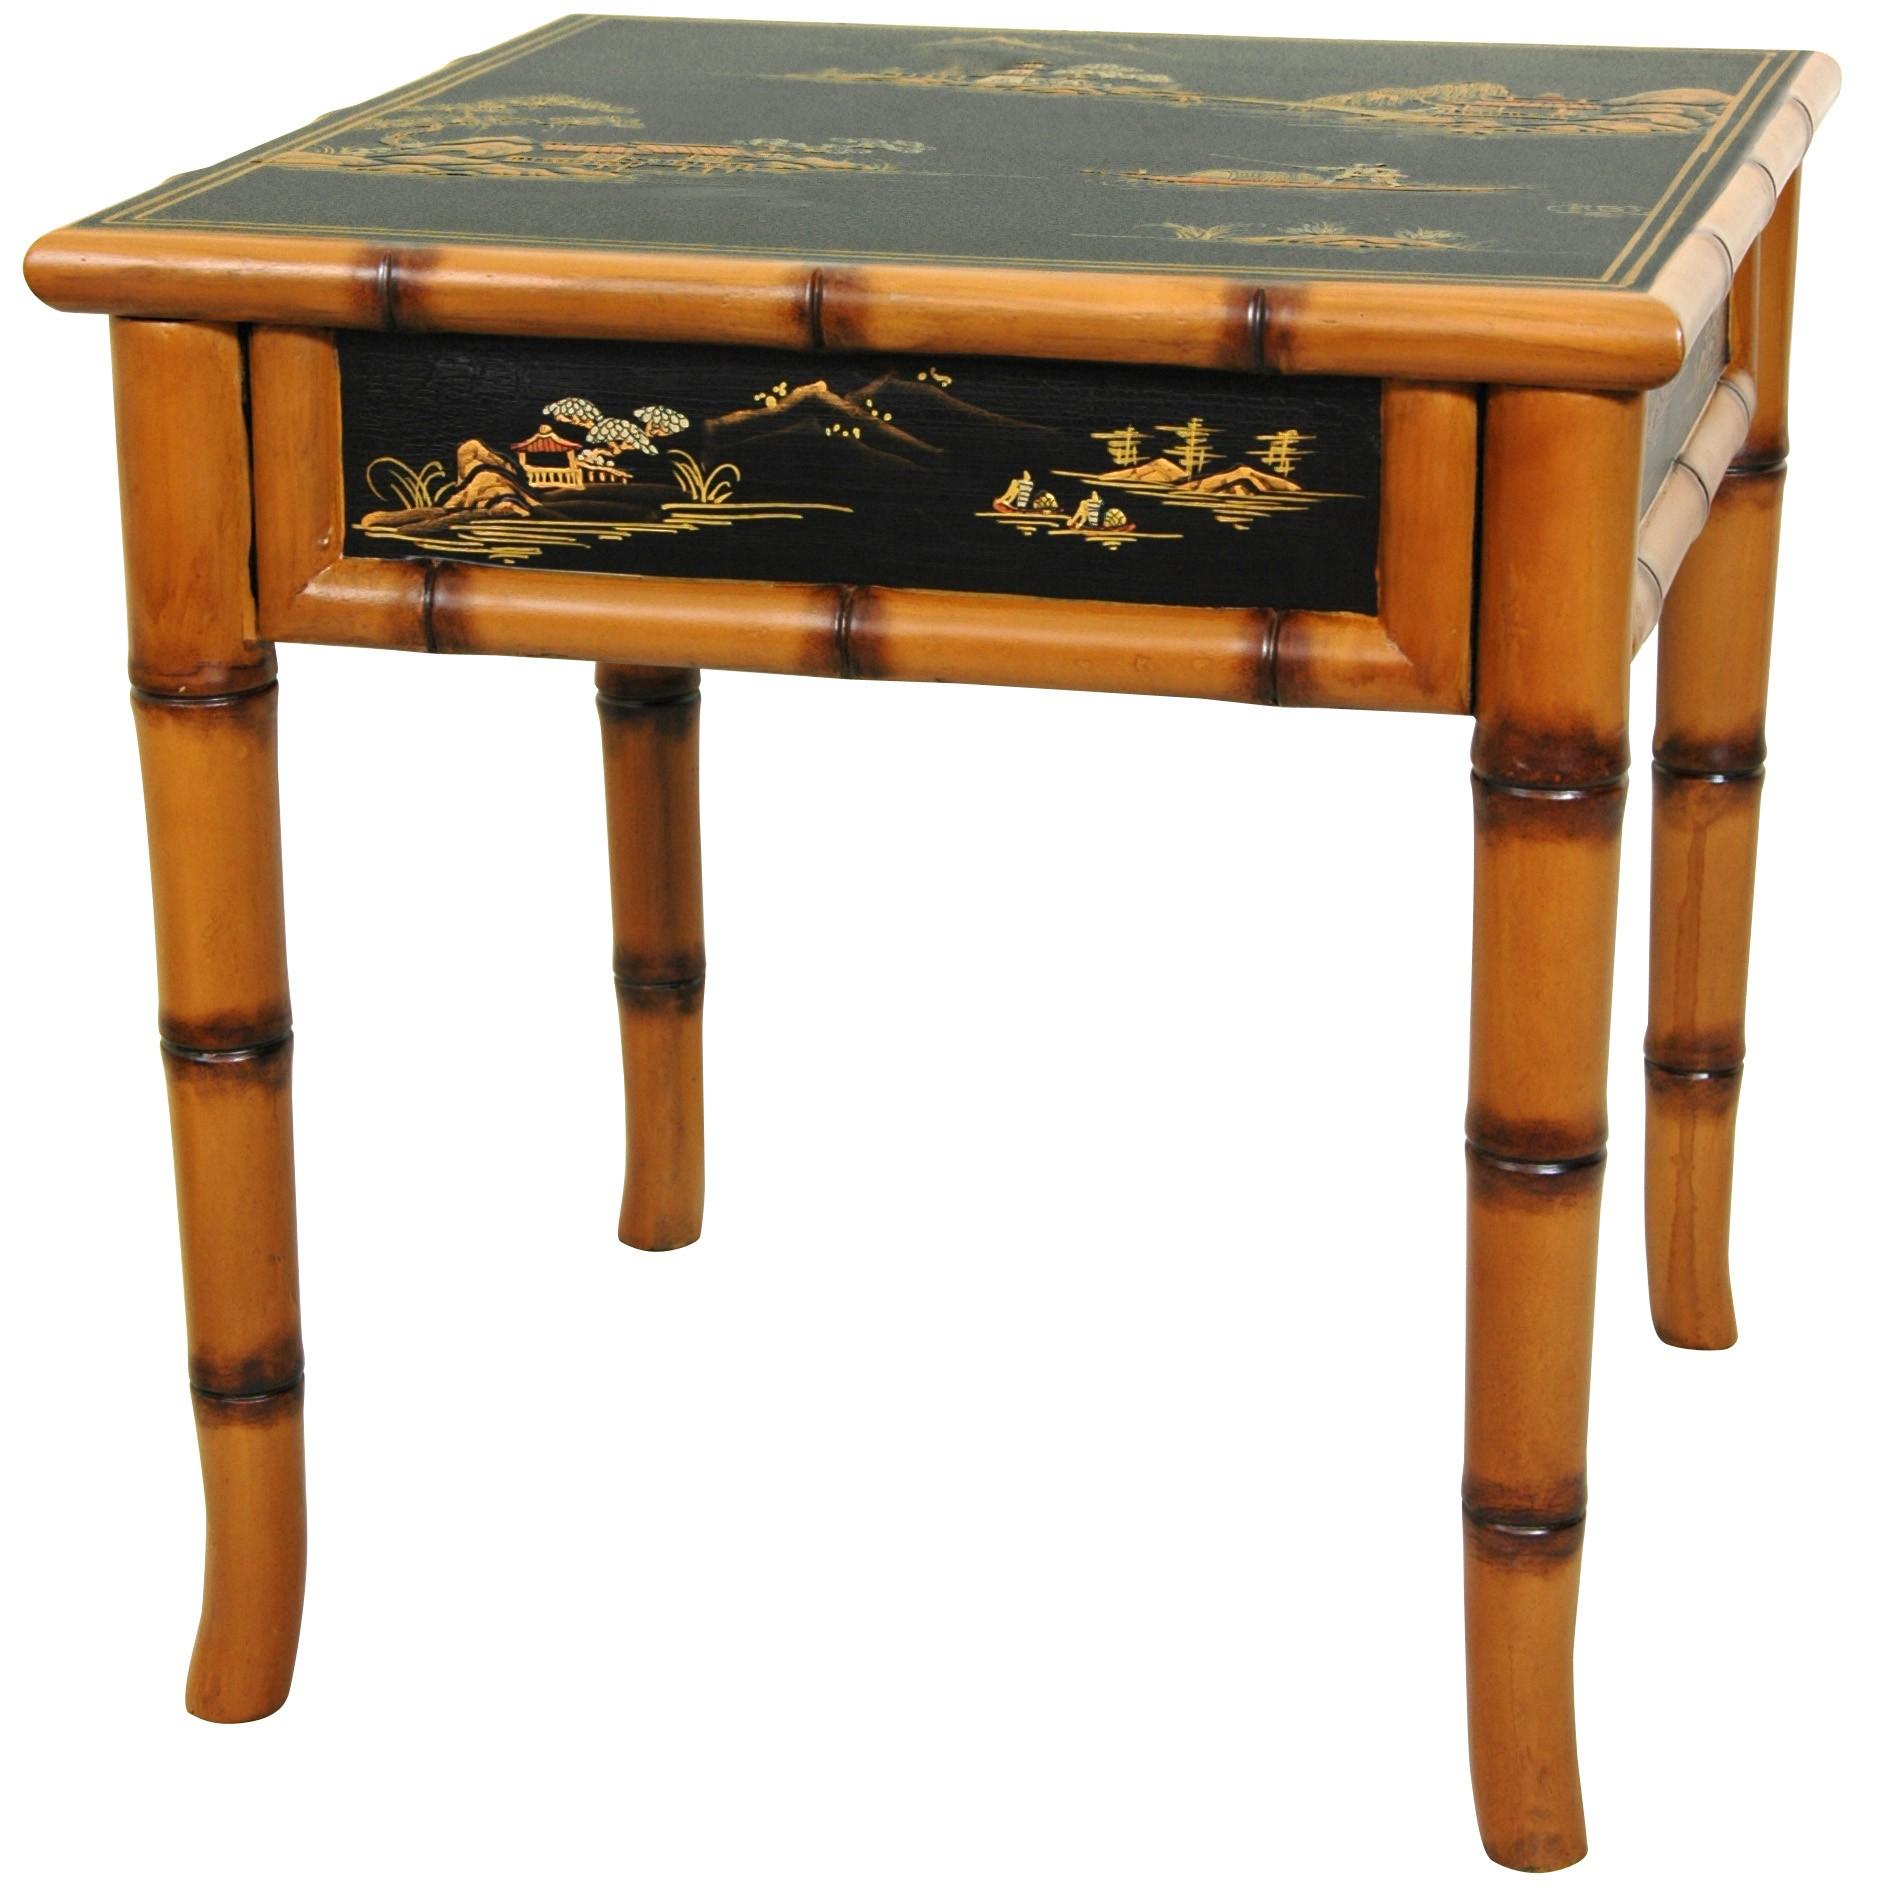 Oriental Furniture Unique Asian Furniture And Decor 18 Inch Ching Square  Black Lacquer Oriental End